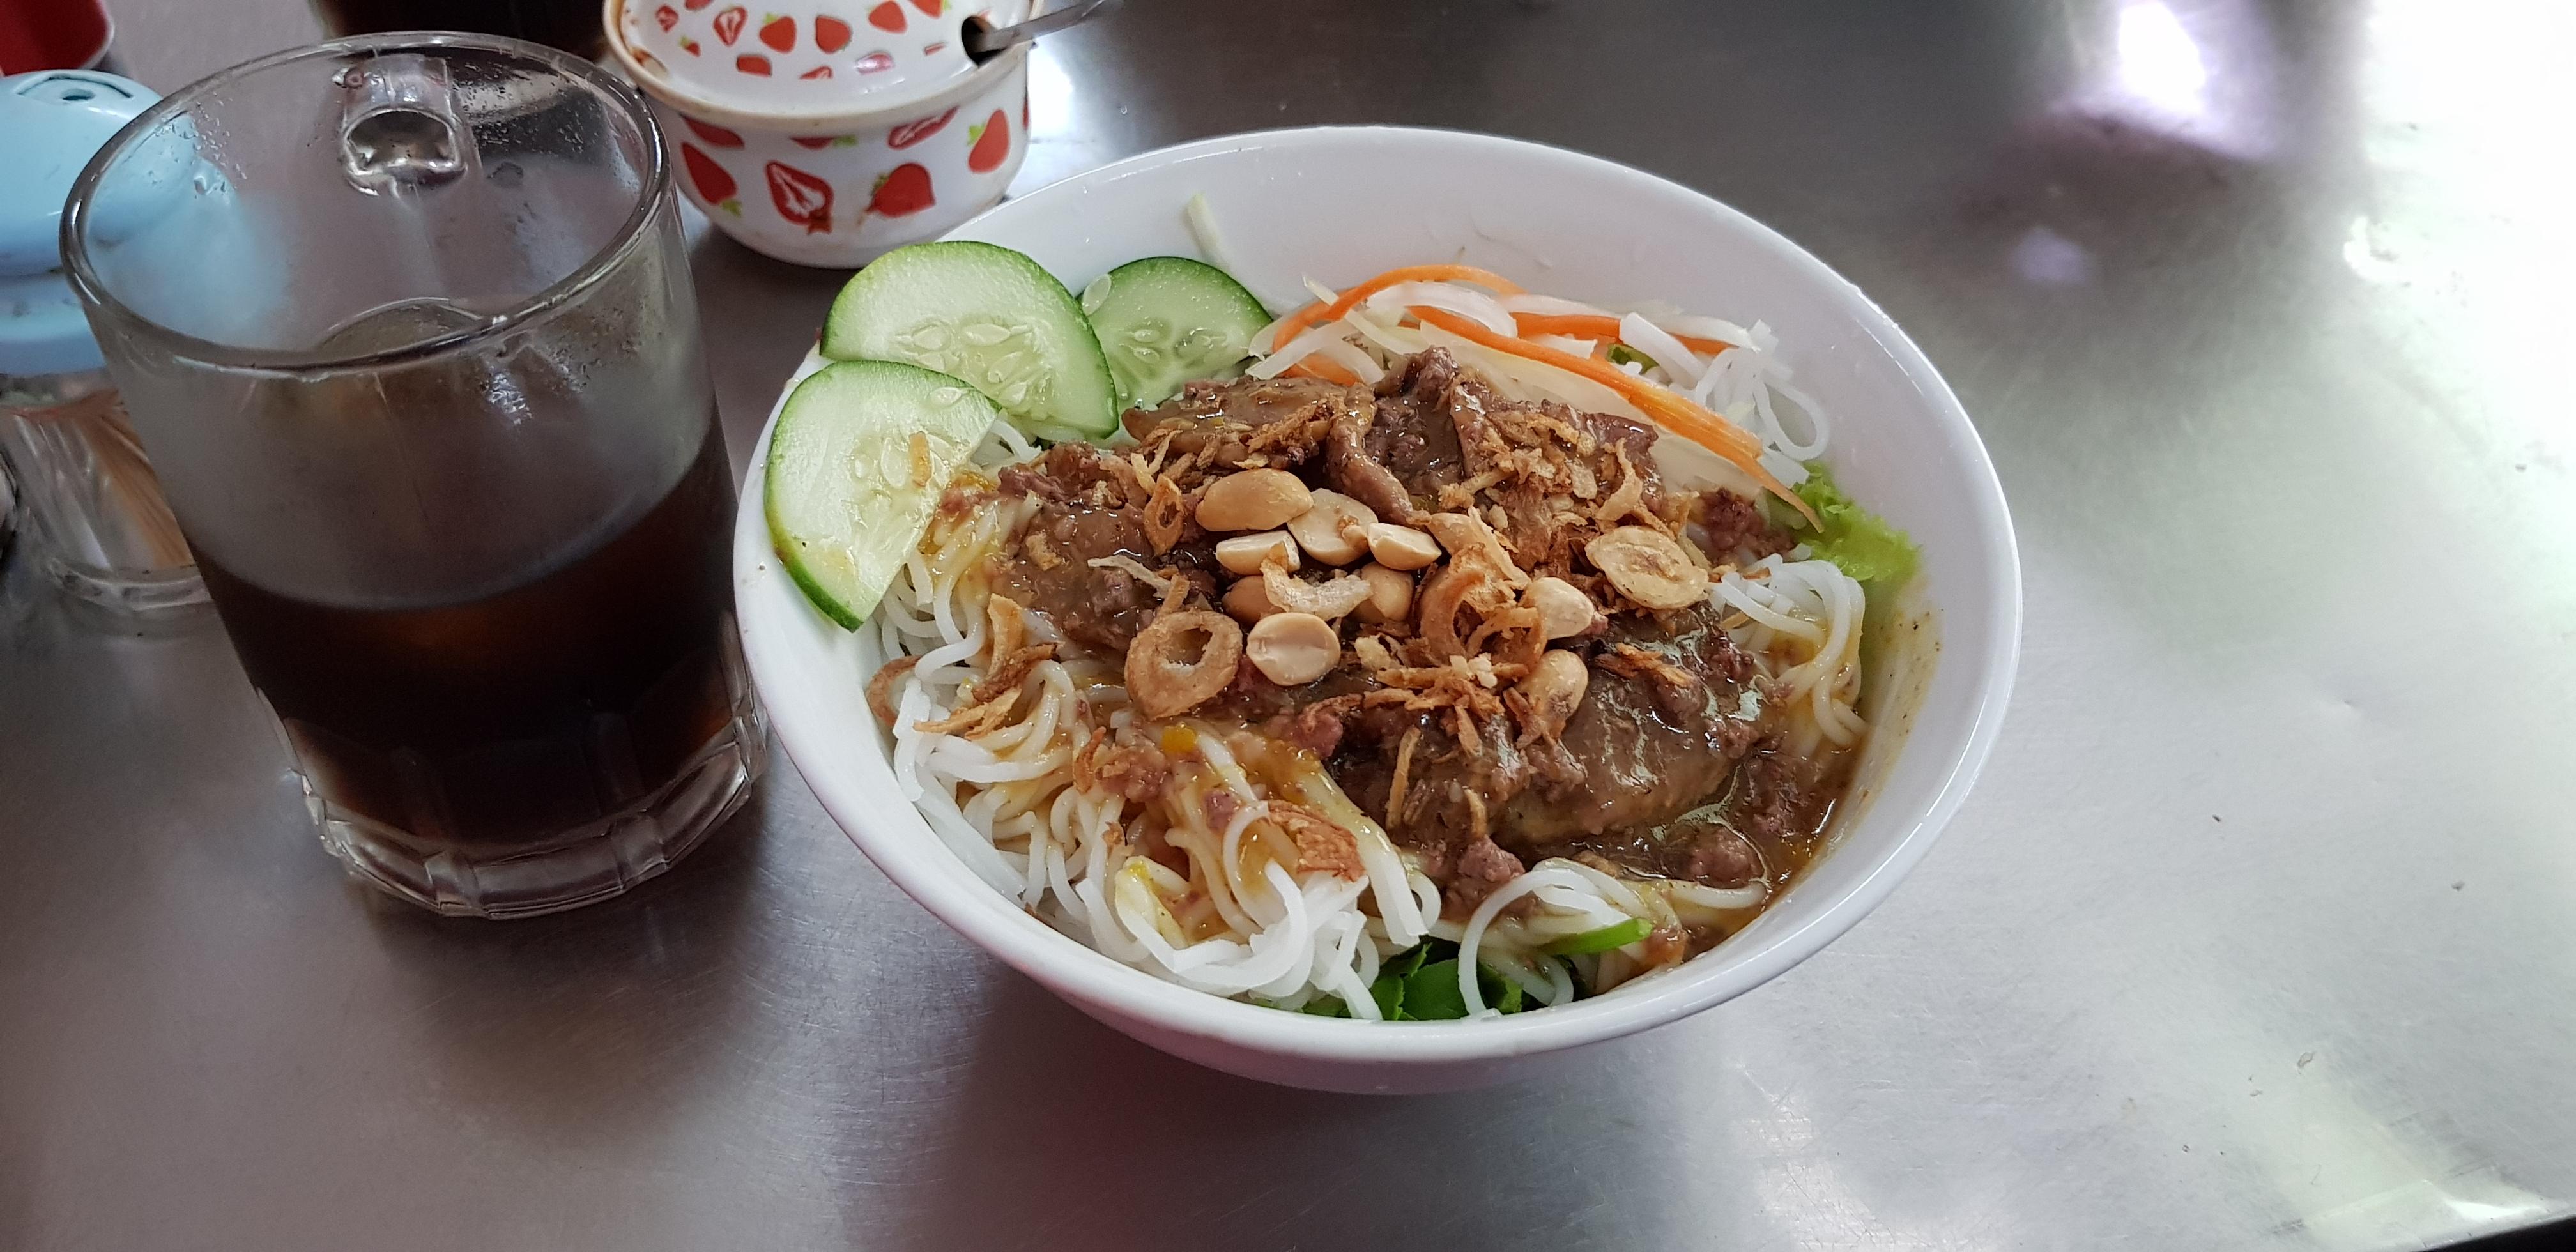 Bún Bò Nam Bộ Bún Bò Xào